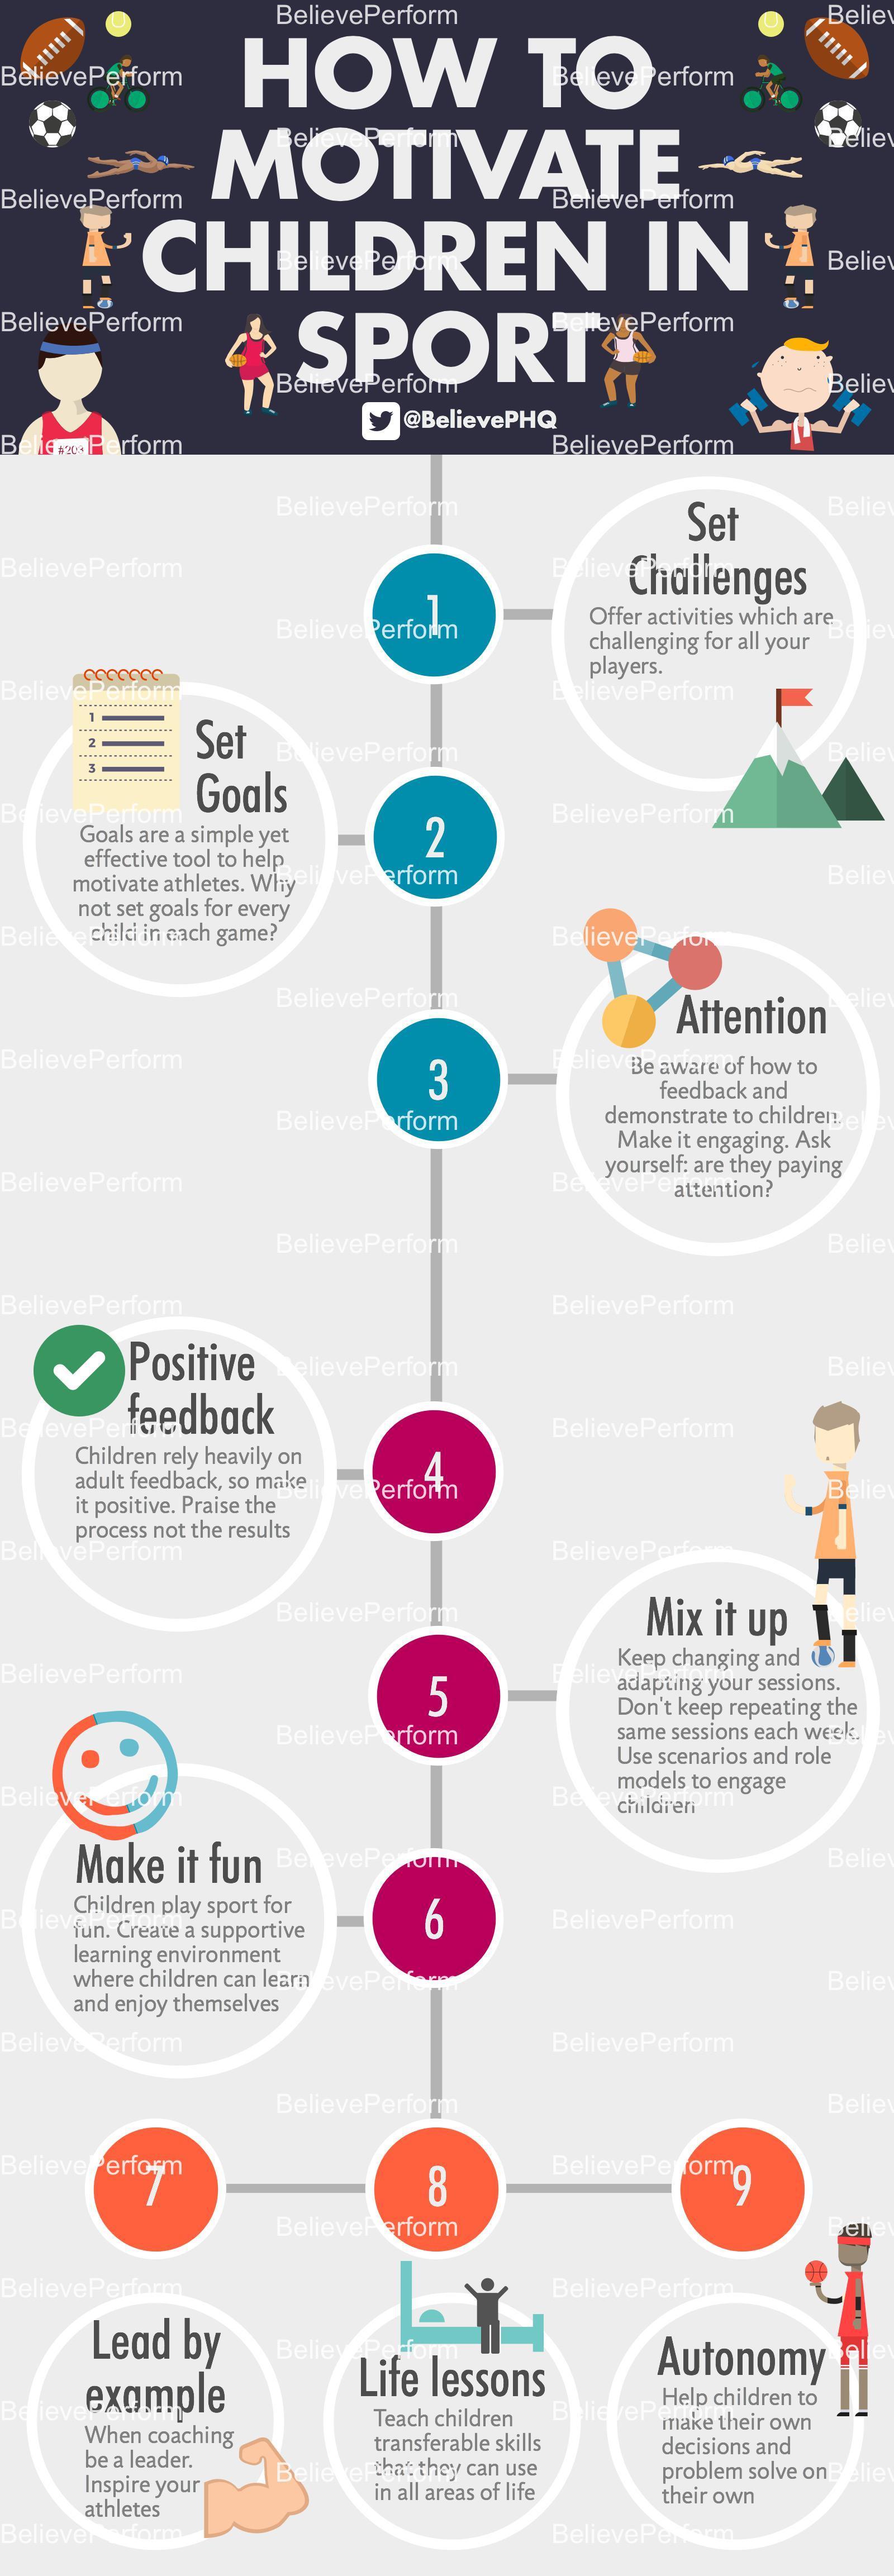 How to motivate children in sport